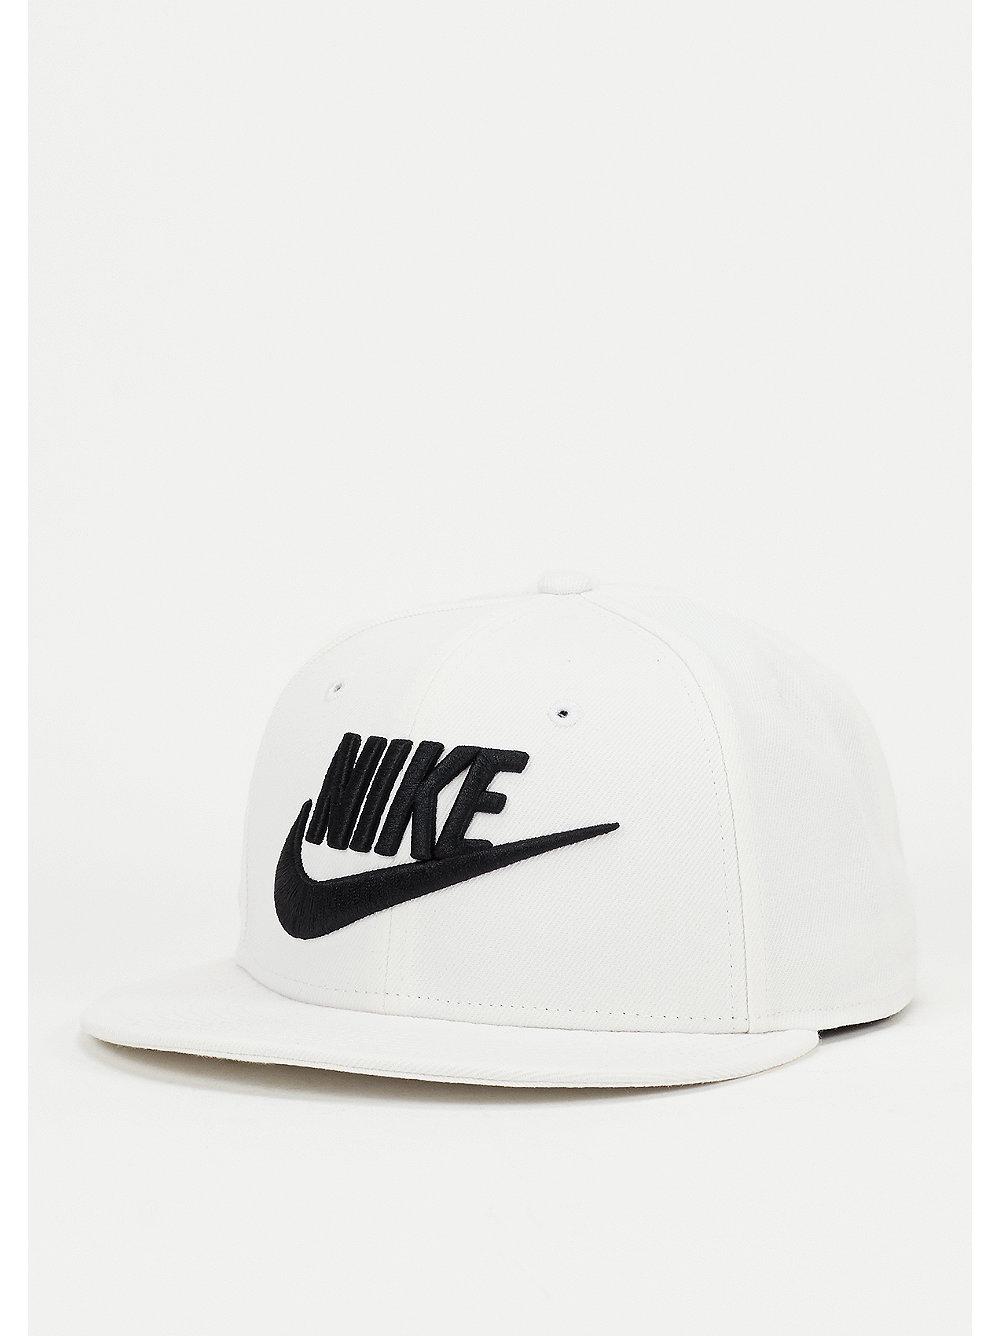 Nike Kappe Snipes